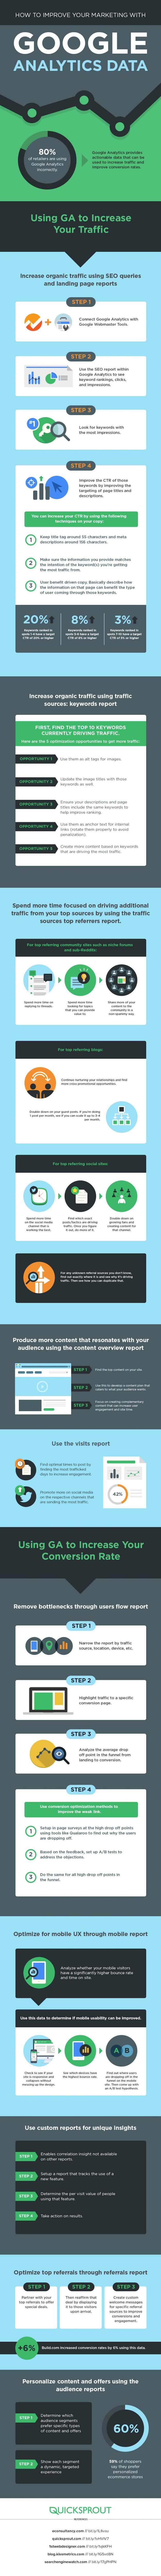 google_analytics_infographic